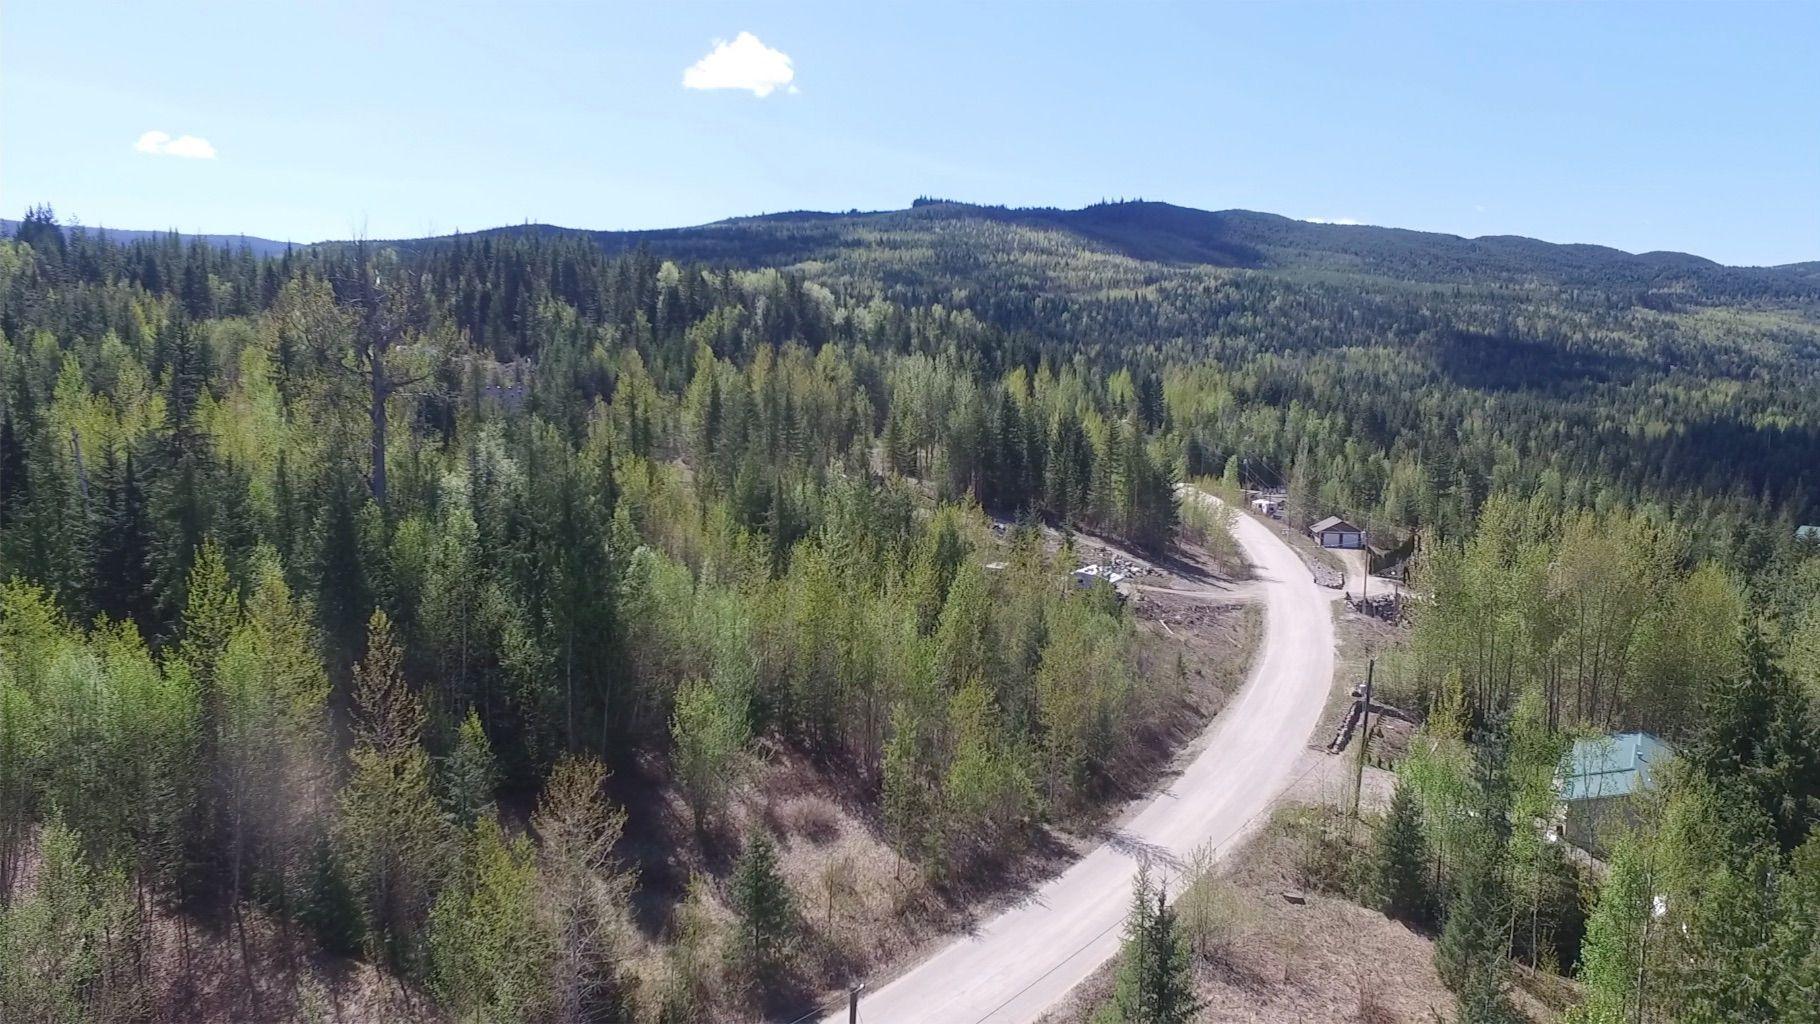 Main Photo: Lot 23 Ridge Road: Eagle Bay Vacant Land for sale (South Shuswap)  : MLS®# 10230582